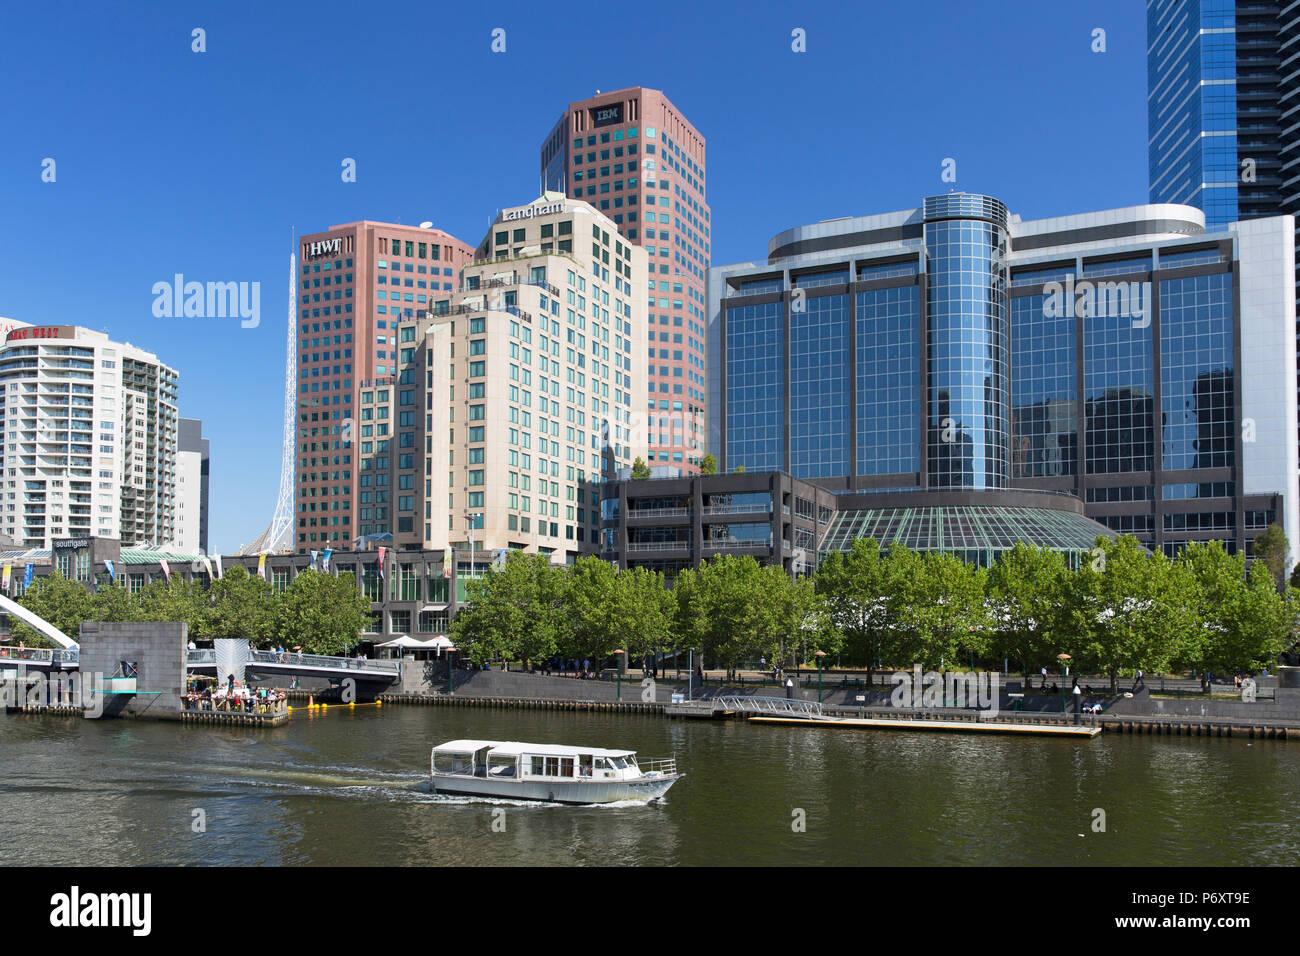 Boat on Yarra River, Melbourne, Victoria, Australia - Stock Image